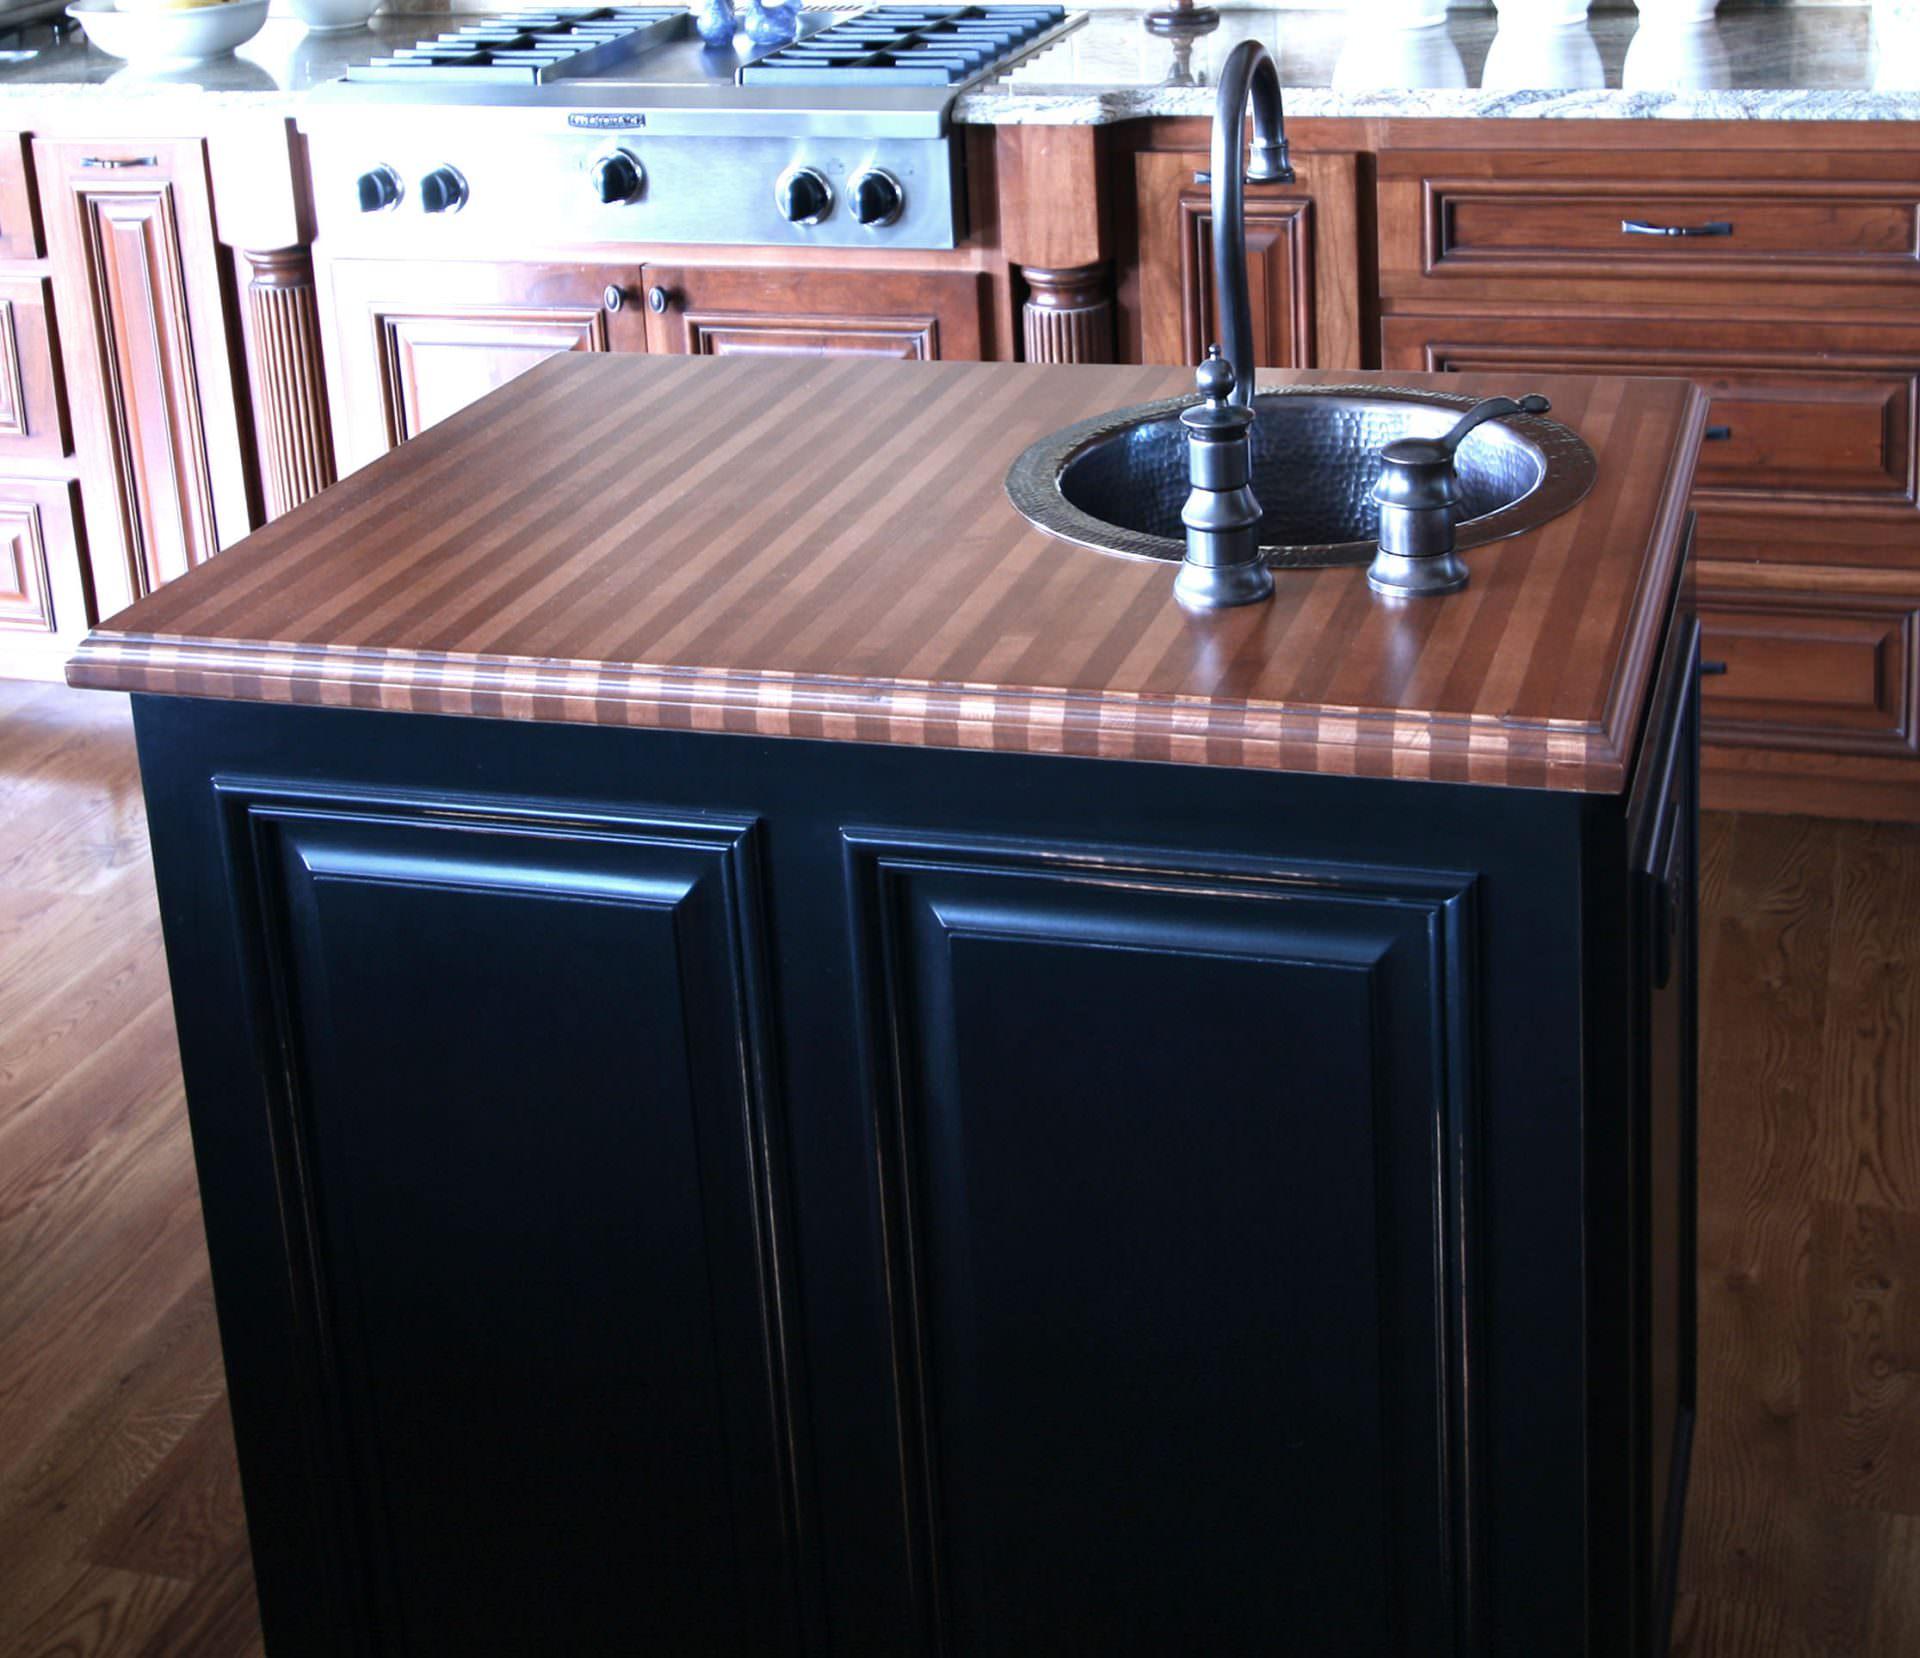 Prep Sinks Walker Woodworking